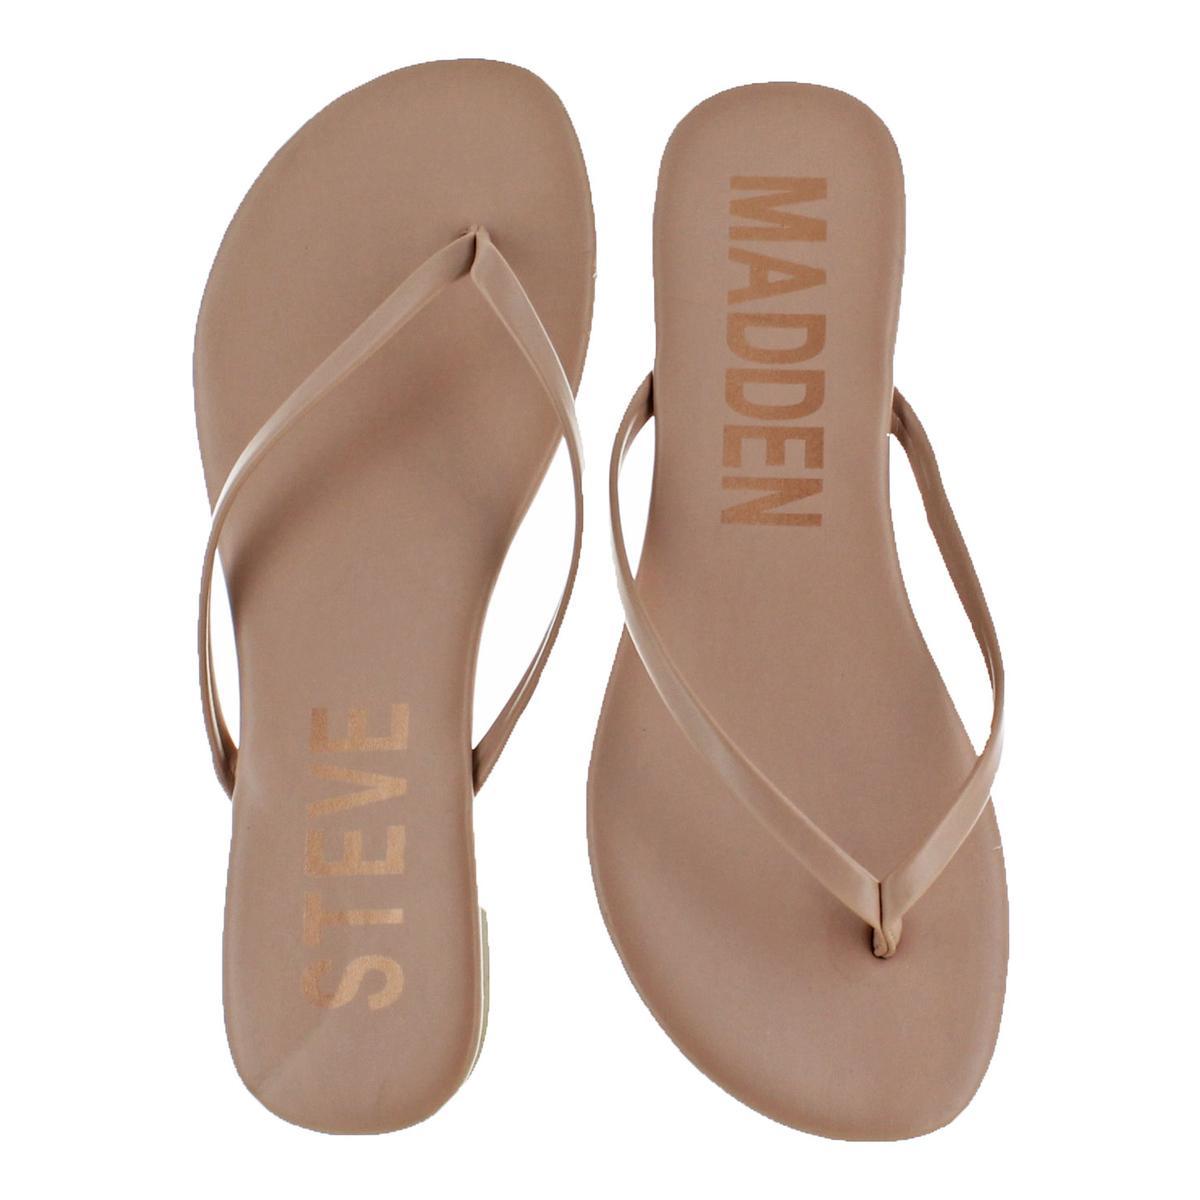 Steve-Madden-Women-039-s-Blink-Slip-On-Casual-Thong-Flat-Sandals-Shoes thumbnail 7